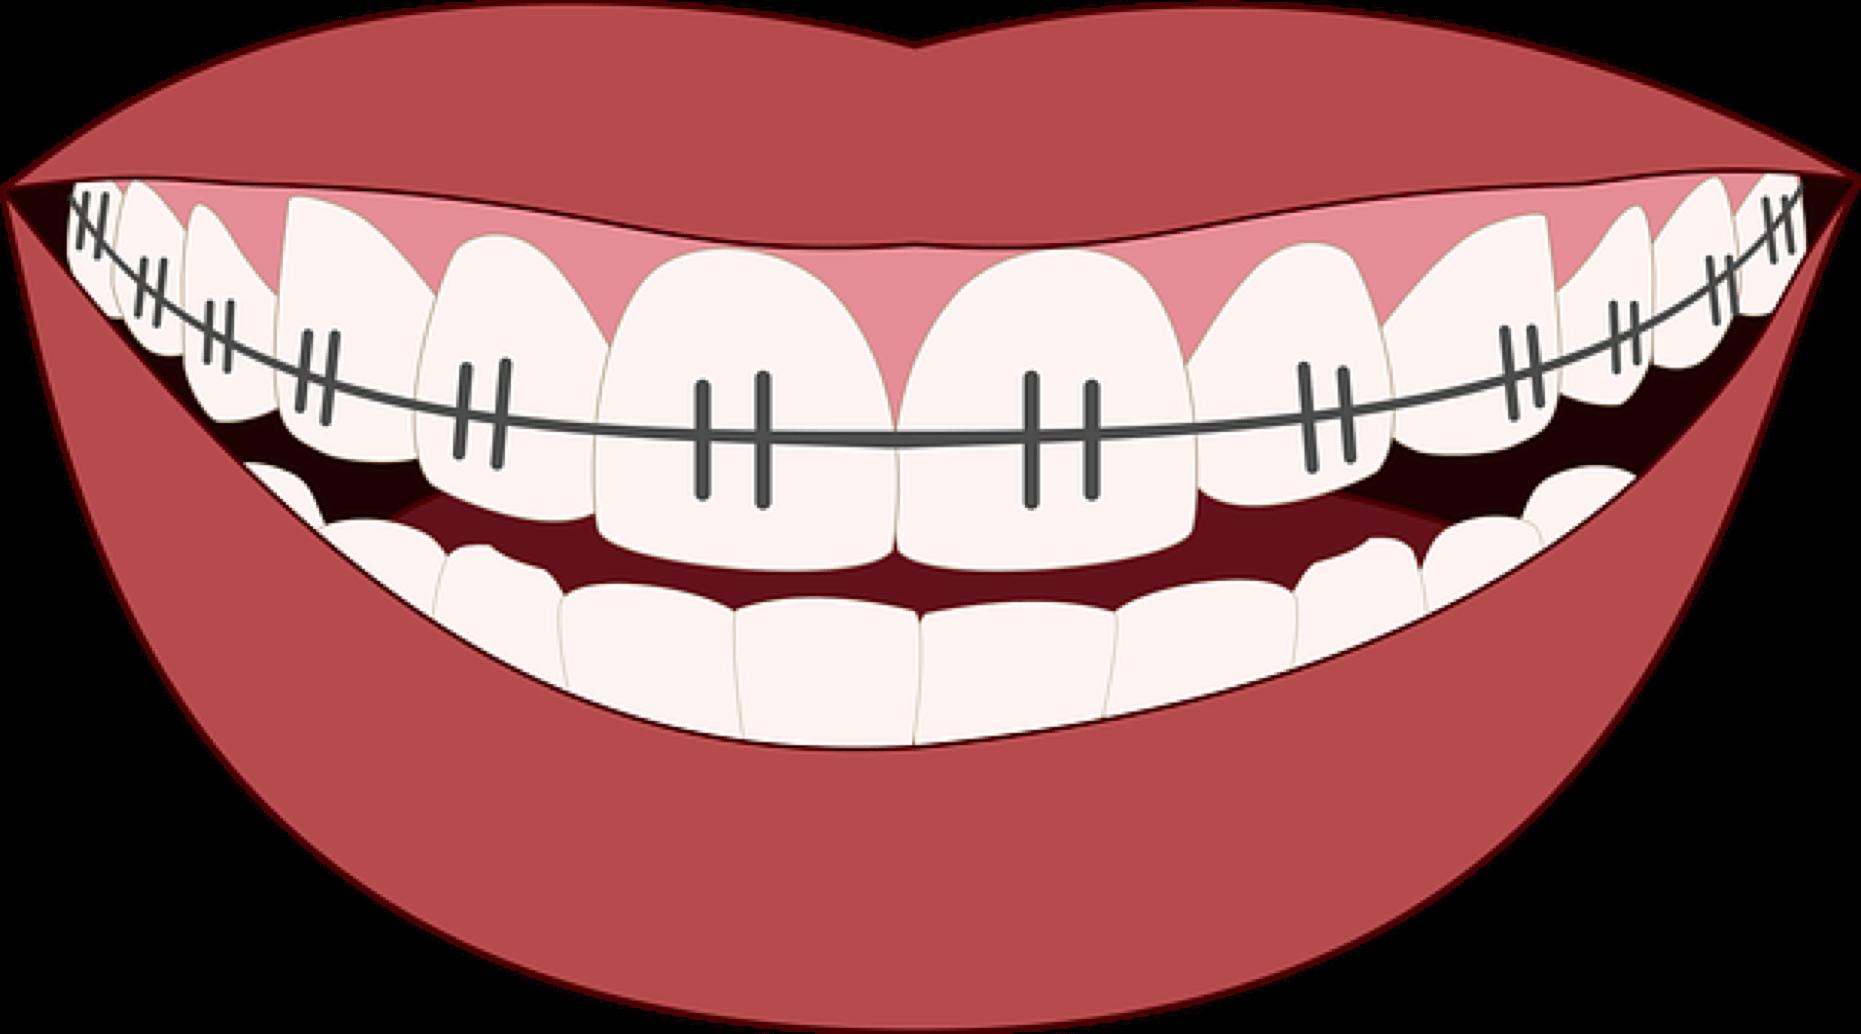 Should you use dental. Clipart smile brace